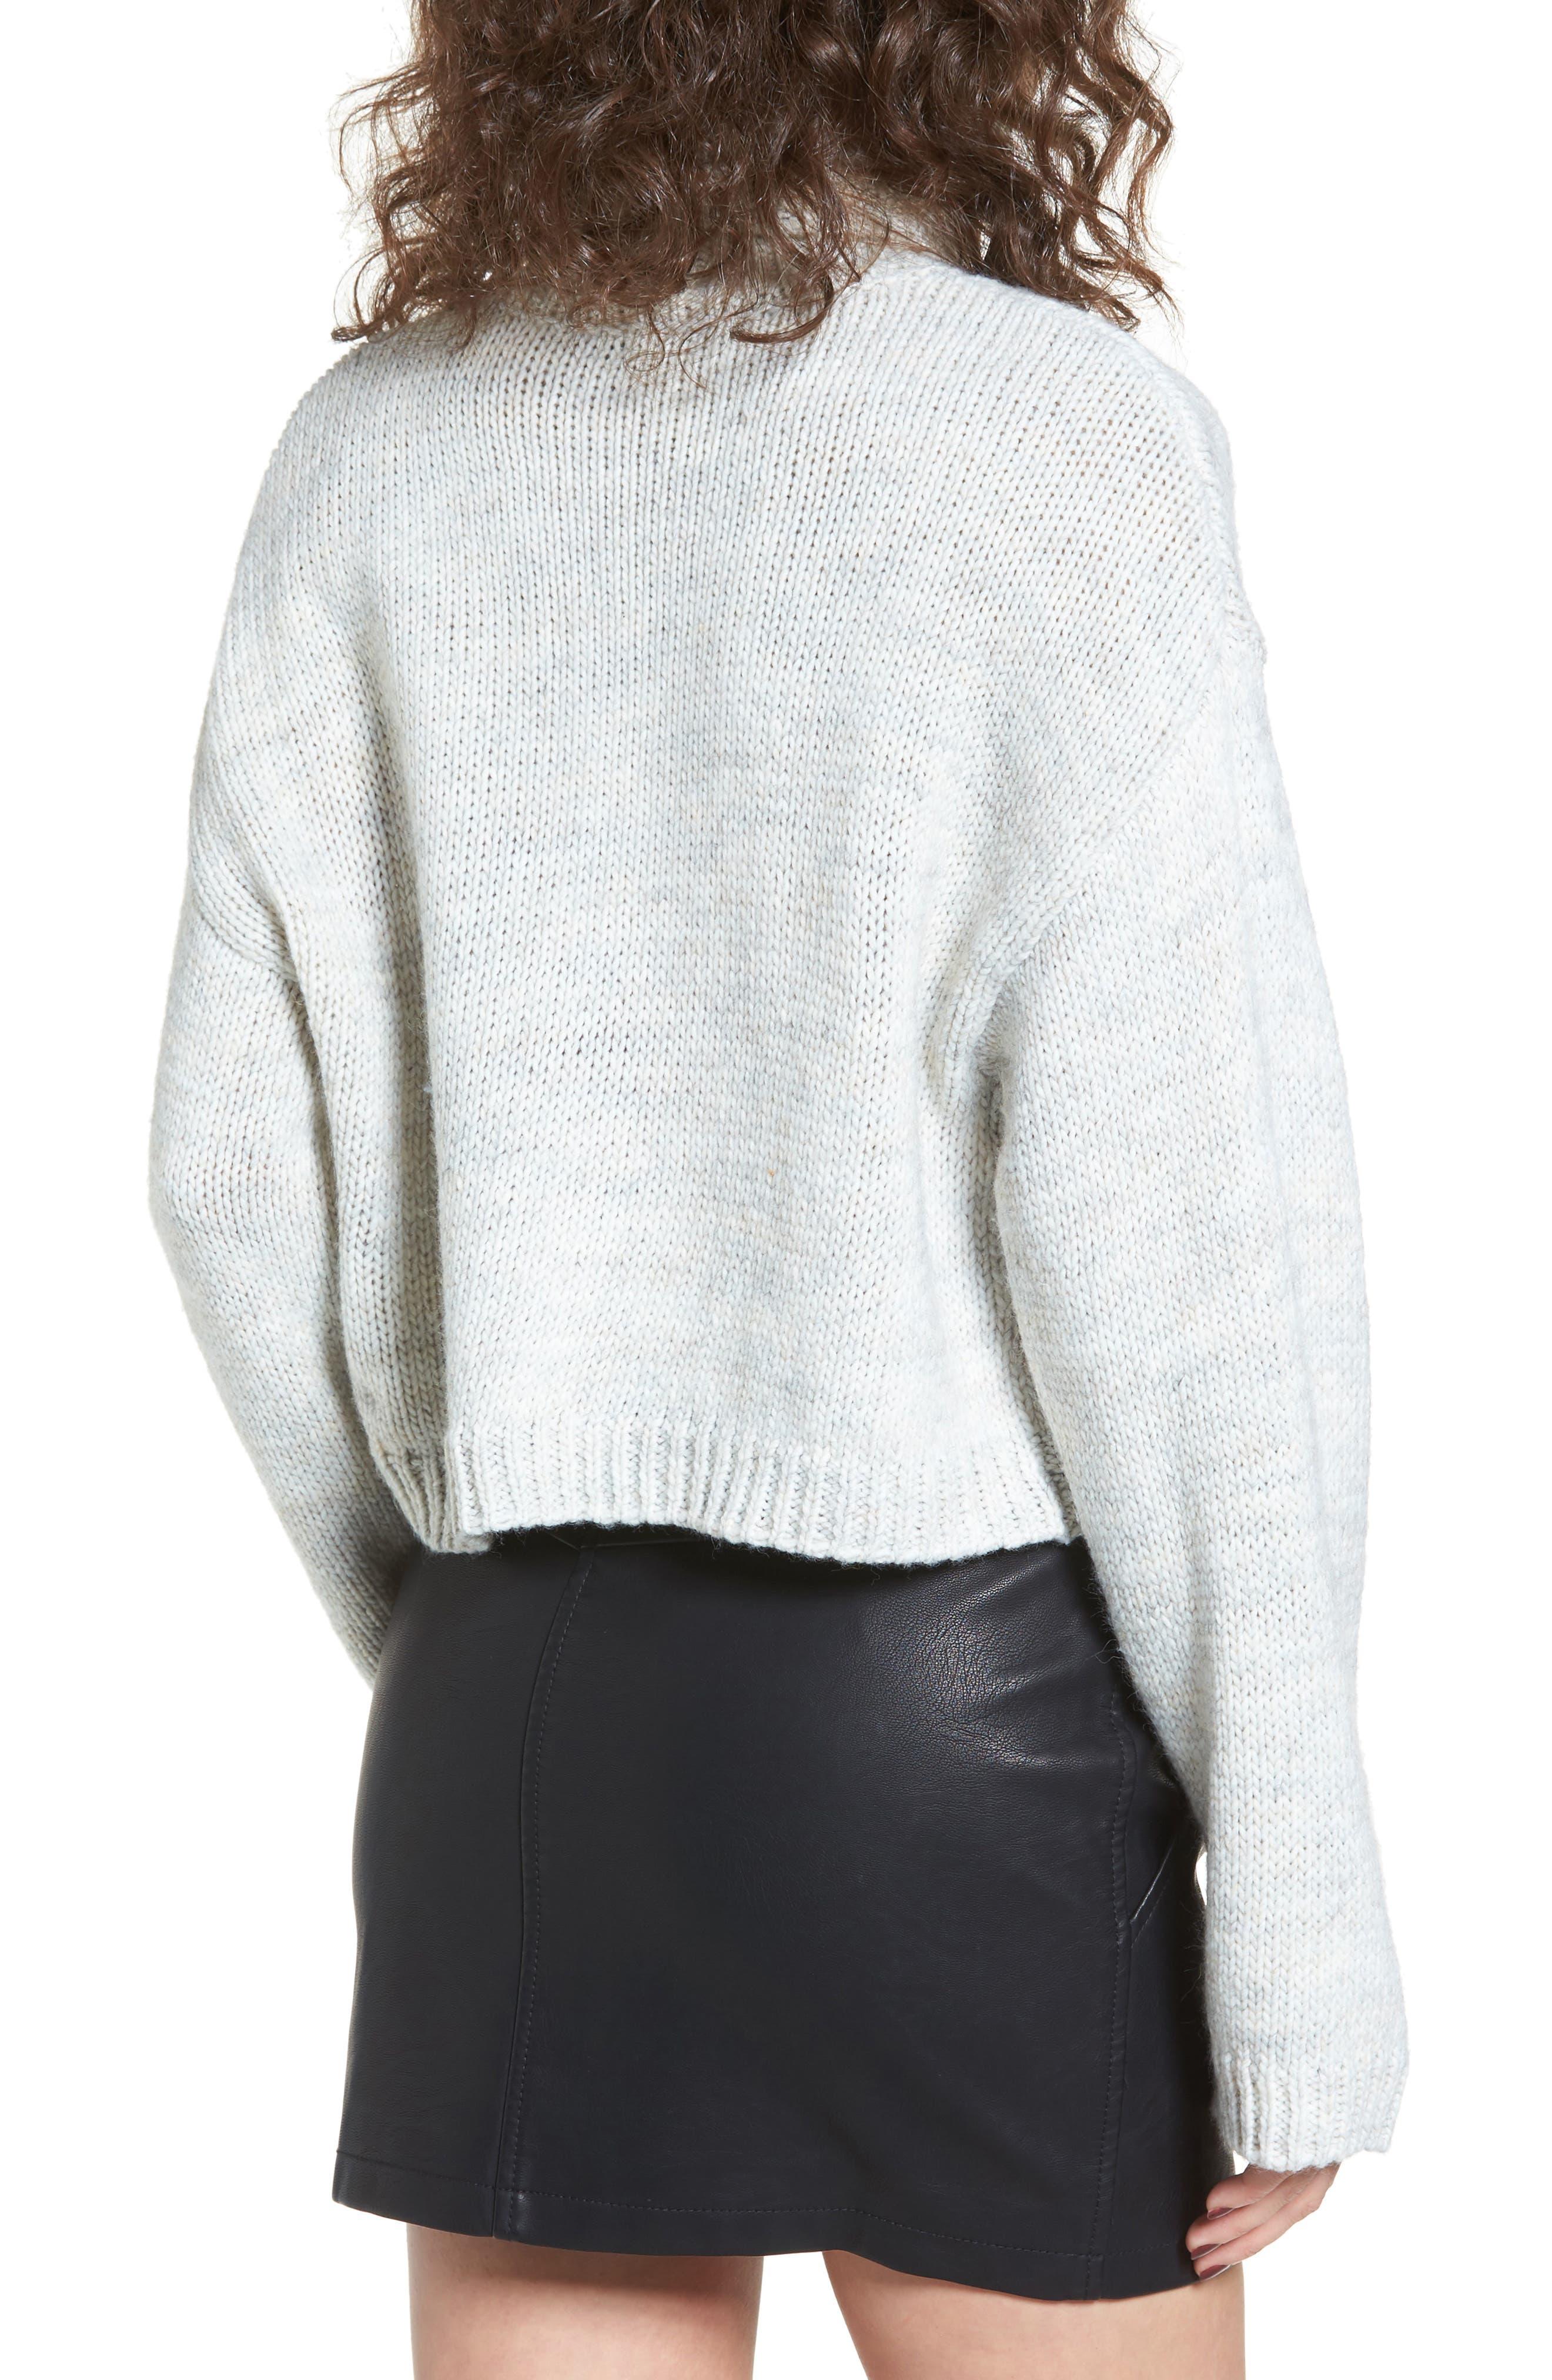 Skelter Turtleneck Sweater,                             Alternate thumbnail 2, color,                             Heather Grey